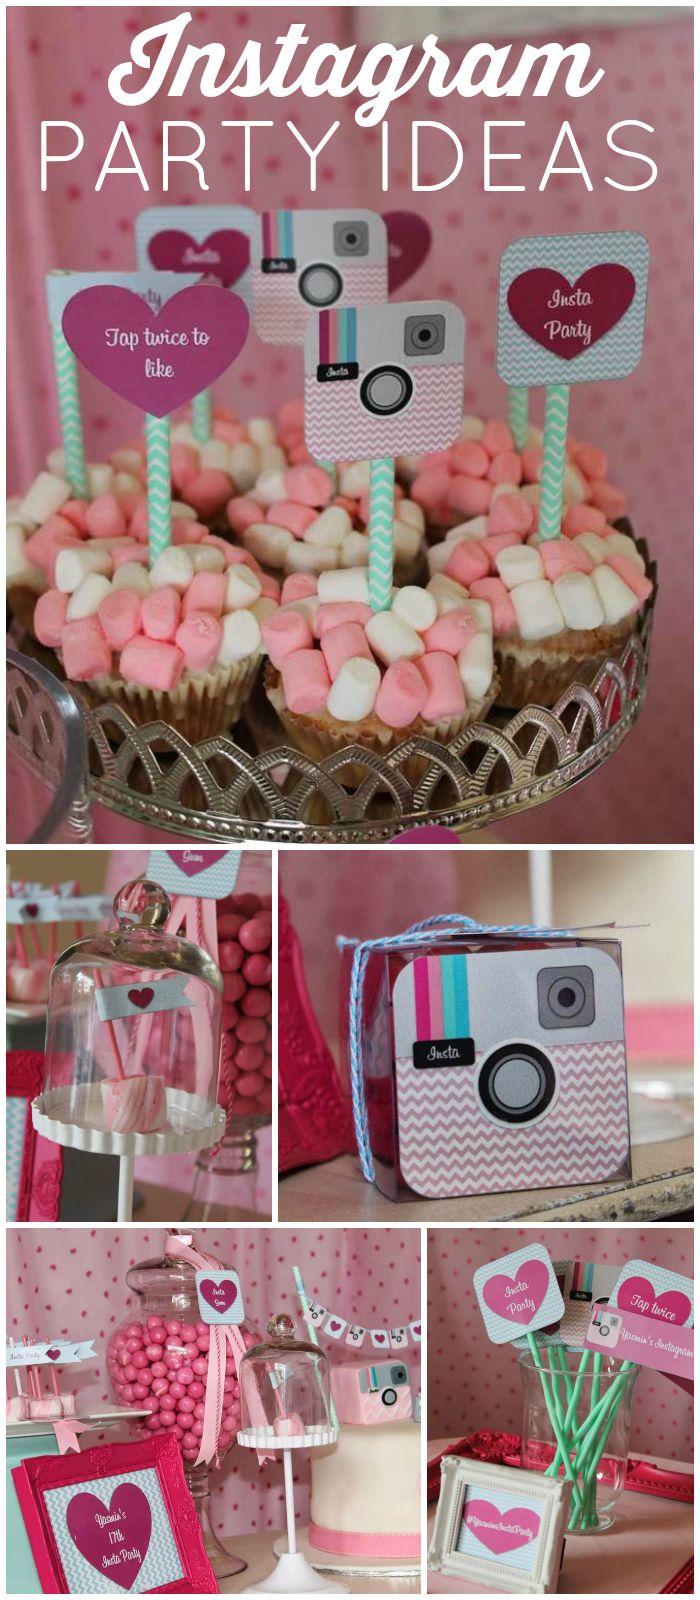 Best 10+ Instagram party ideas on Pinterest | Grad parties ...